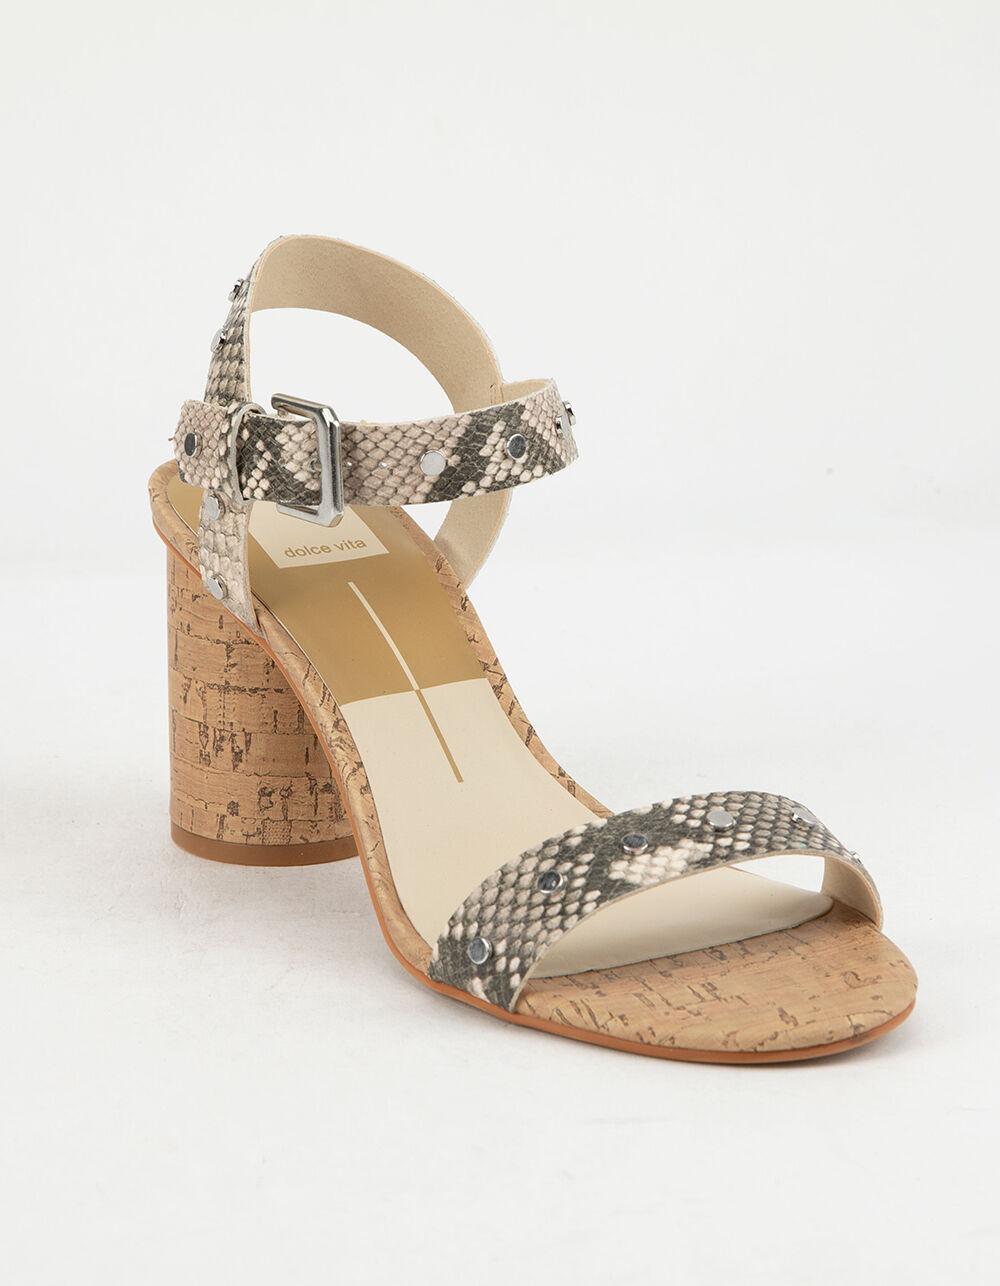 DOLCE Vita Jadyn Snake Print Stella Heeled Sandals